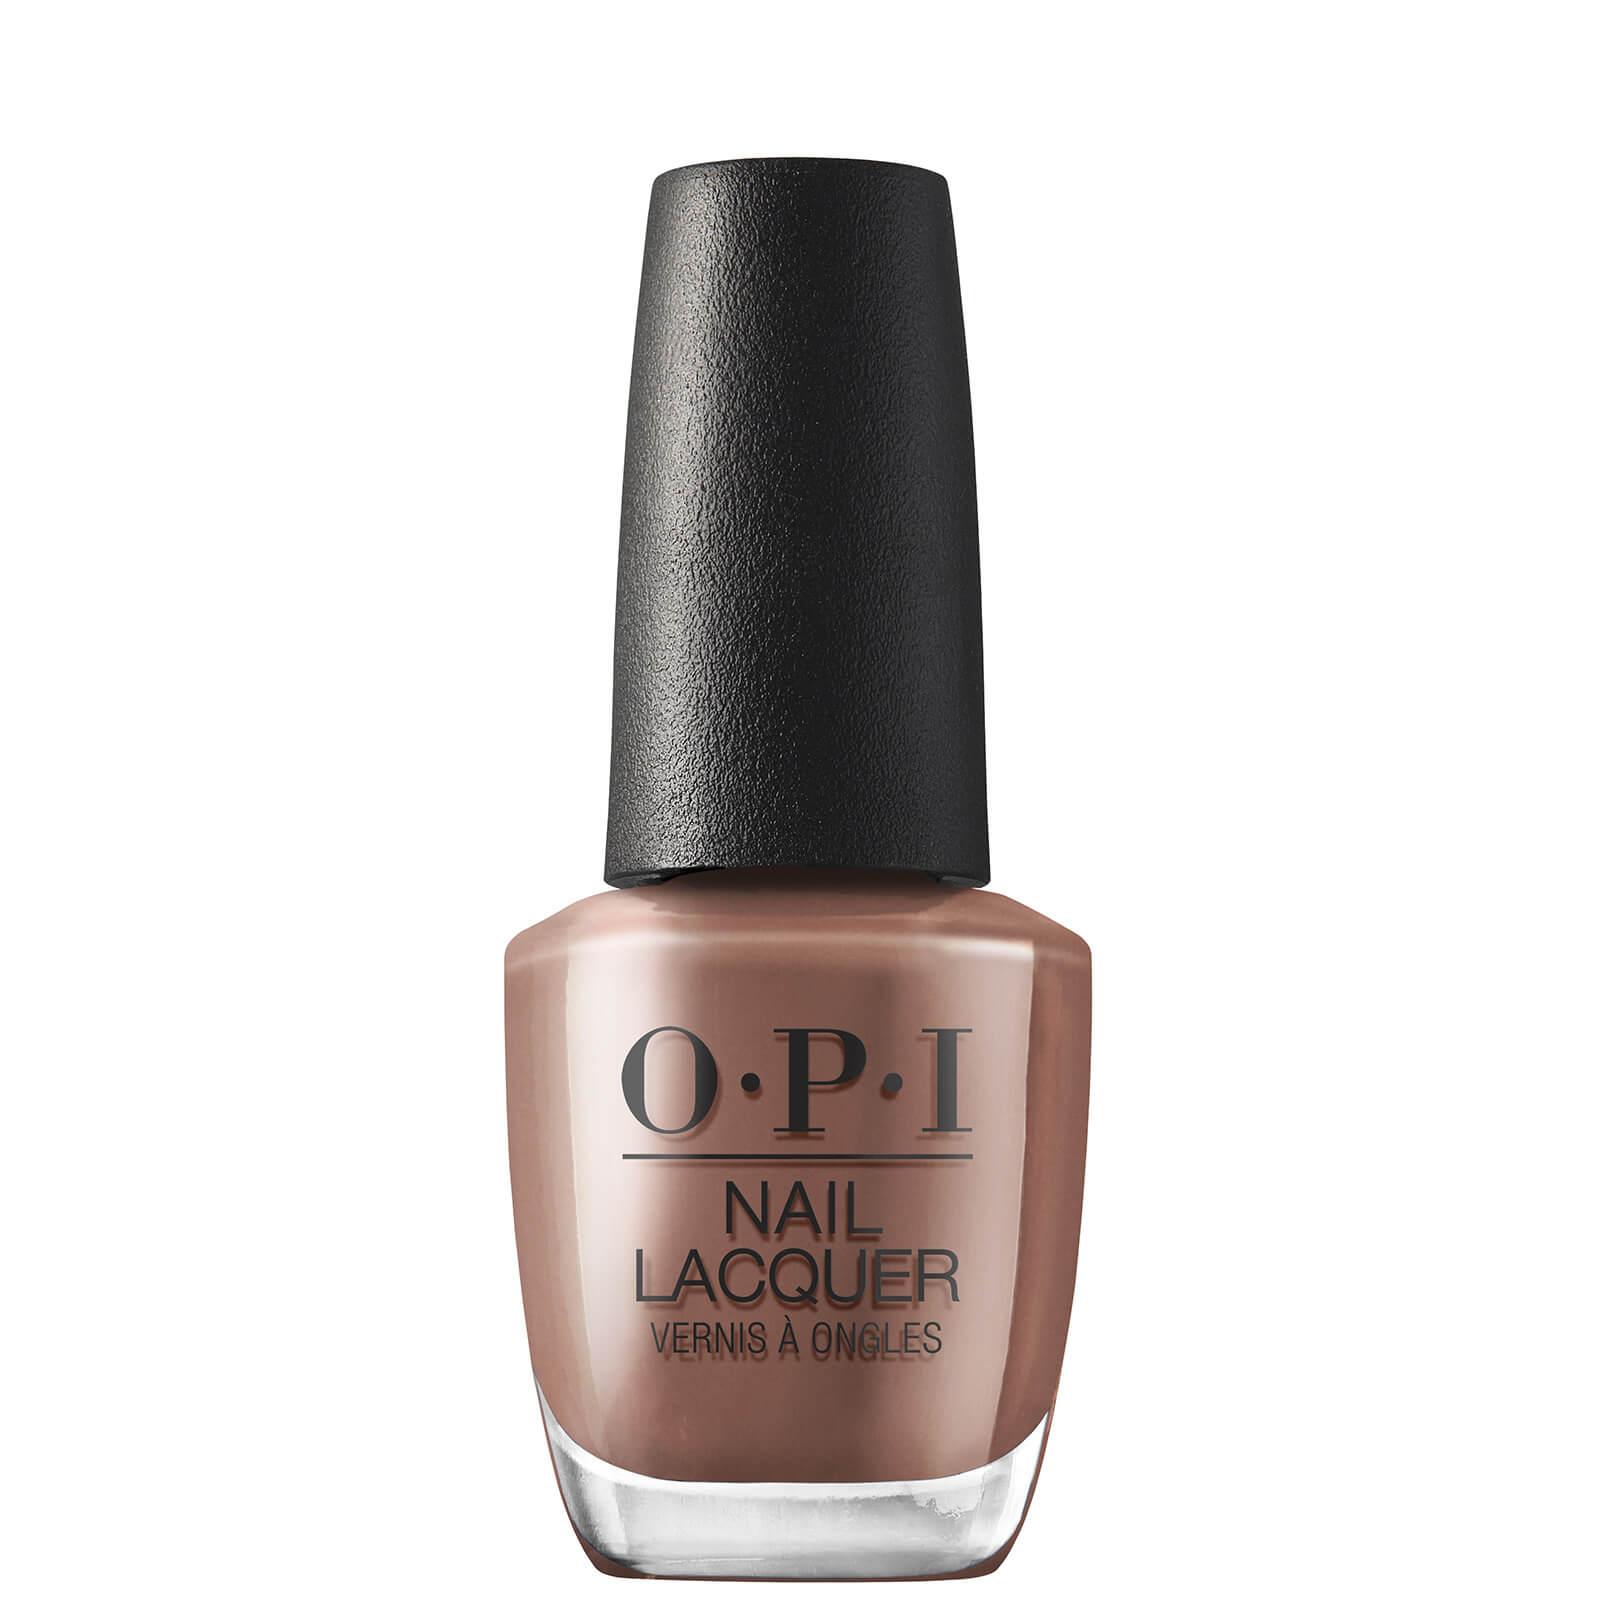 Купить OPI Nail Polish DTLA Collection 15ml (Various Shades) - Espresso Your Inner Self